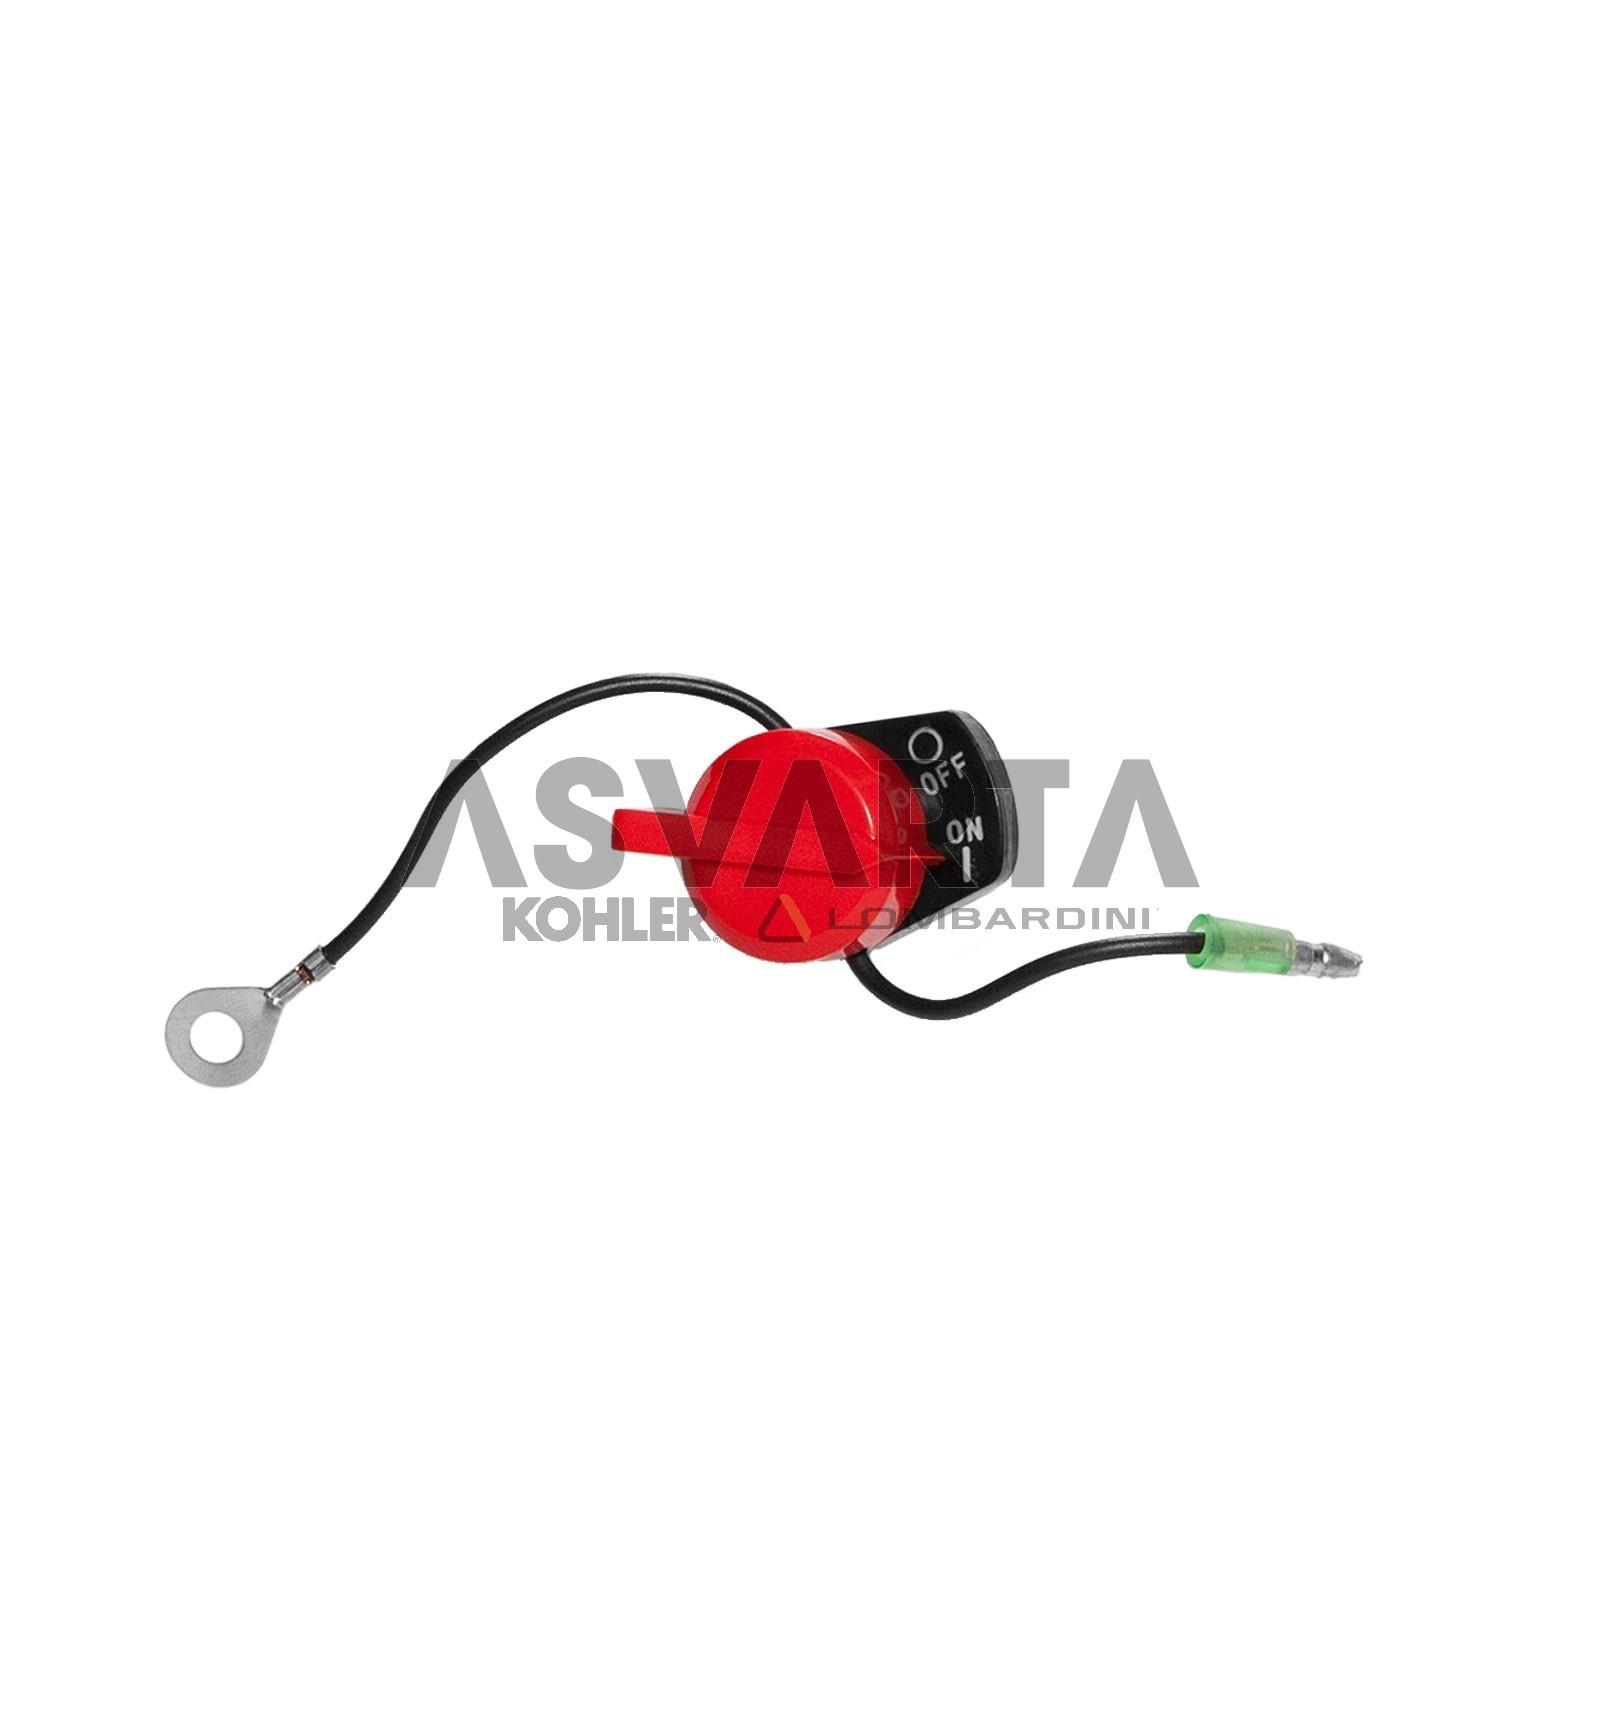 Kohler Switch Ignition Ch Sh